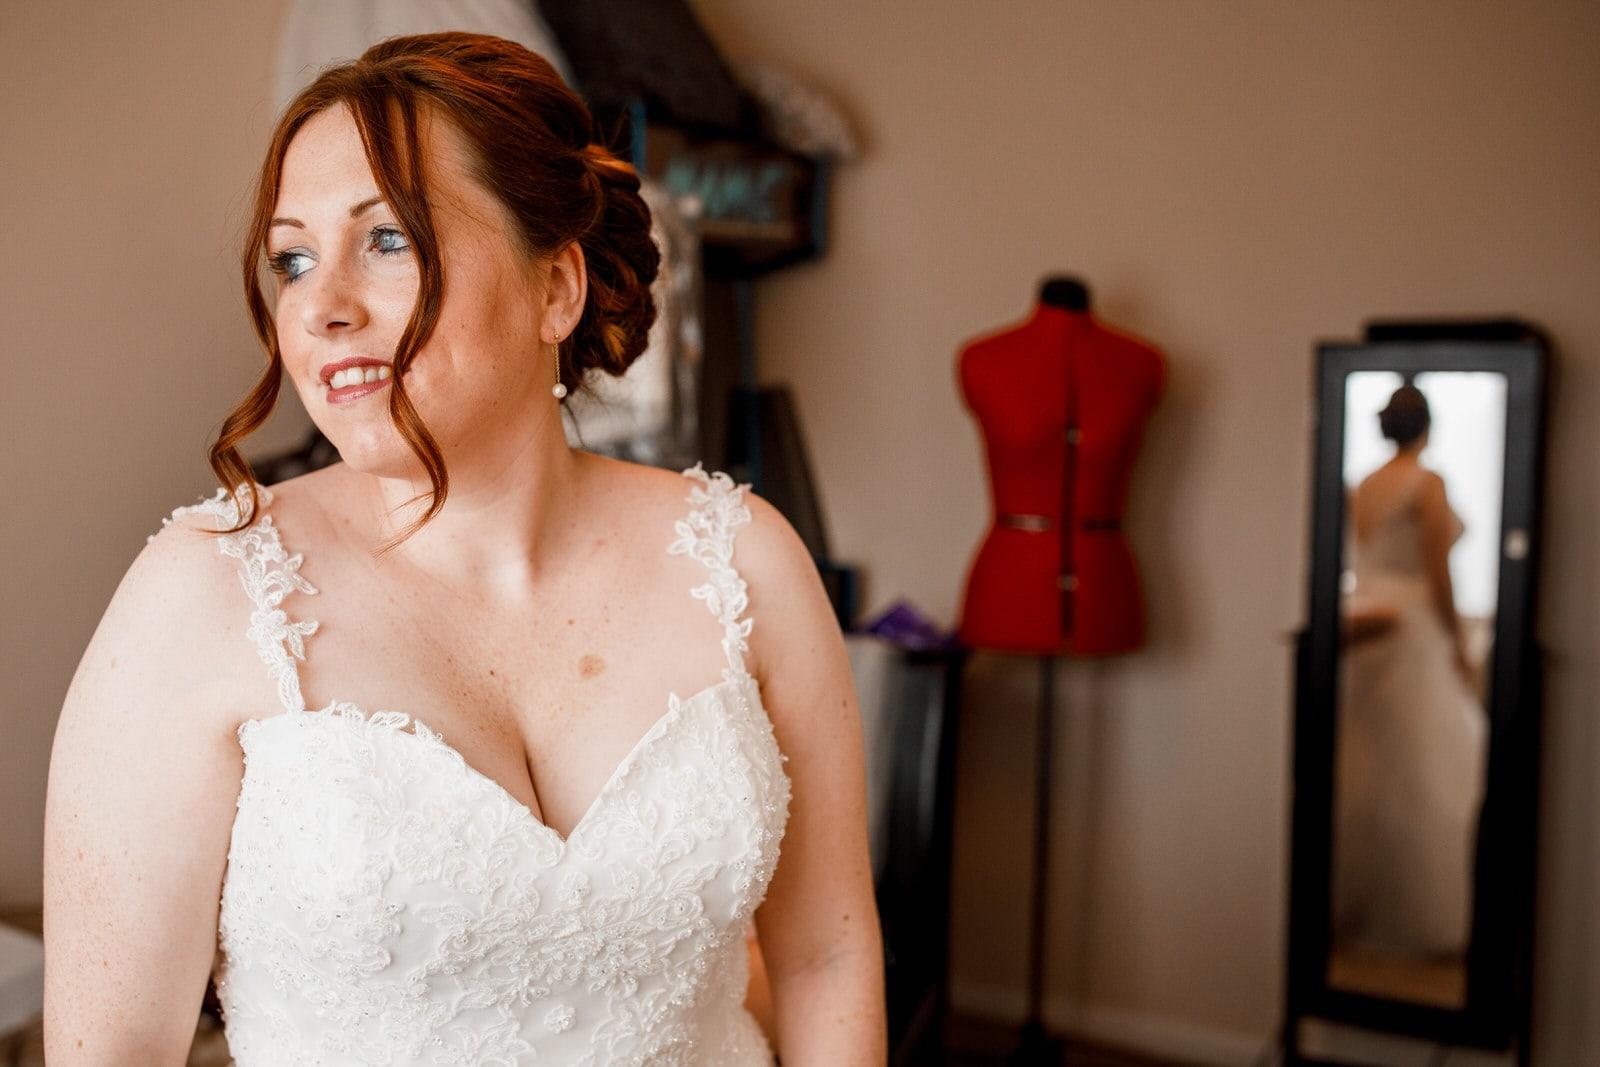 bride getting ready for blenheim palace wedding